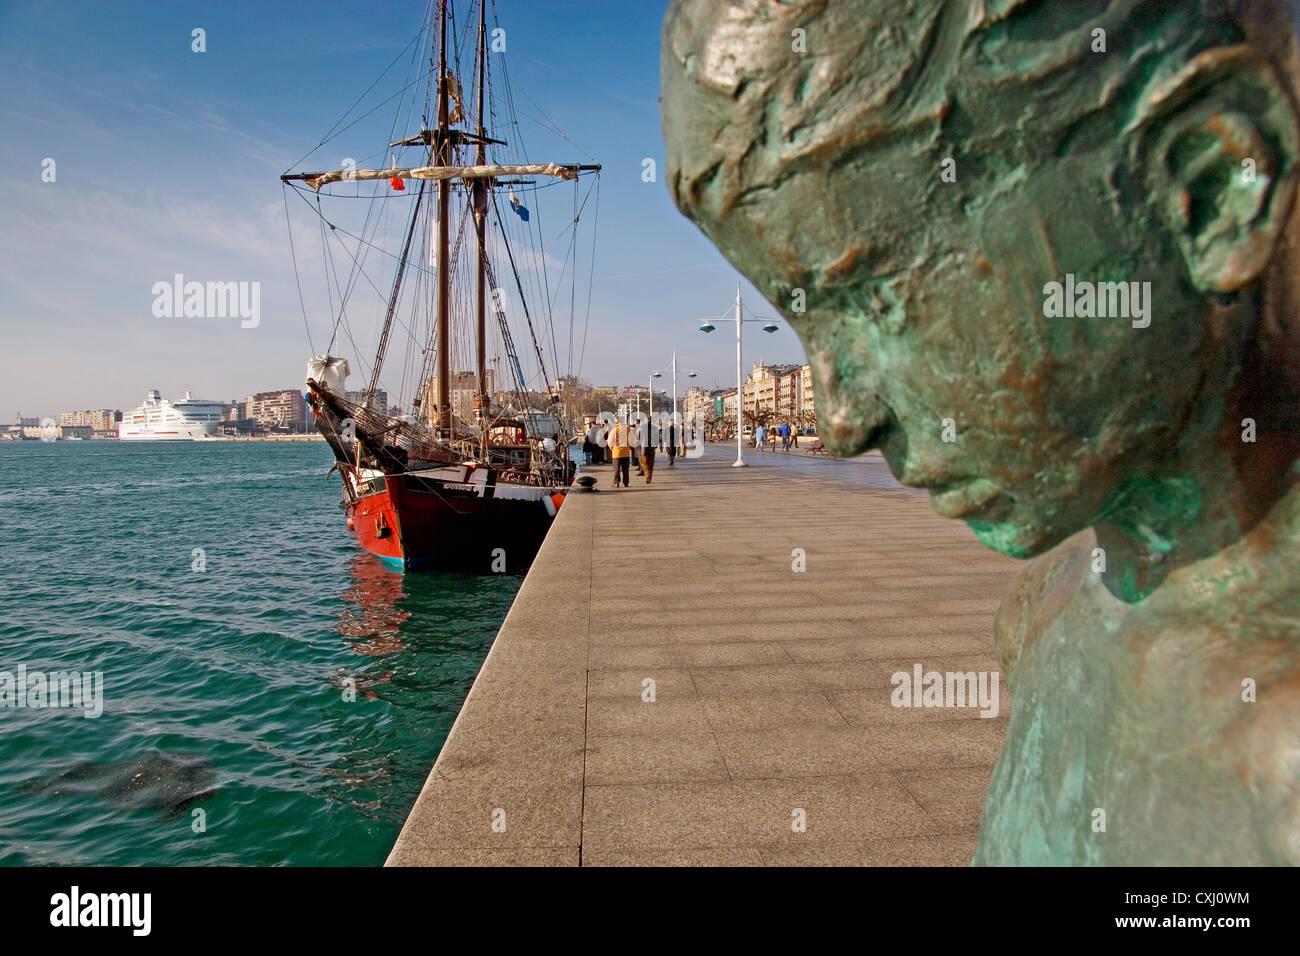 Monumento a Raqueros schooner e Brittany Ferries Santander Cantabria Spagna monumento los raqueros españa Immagini Stock